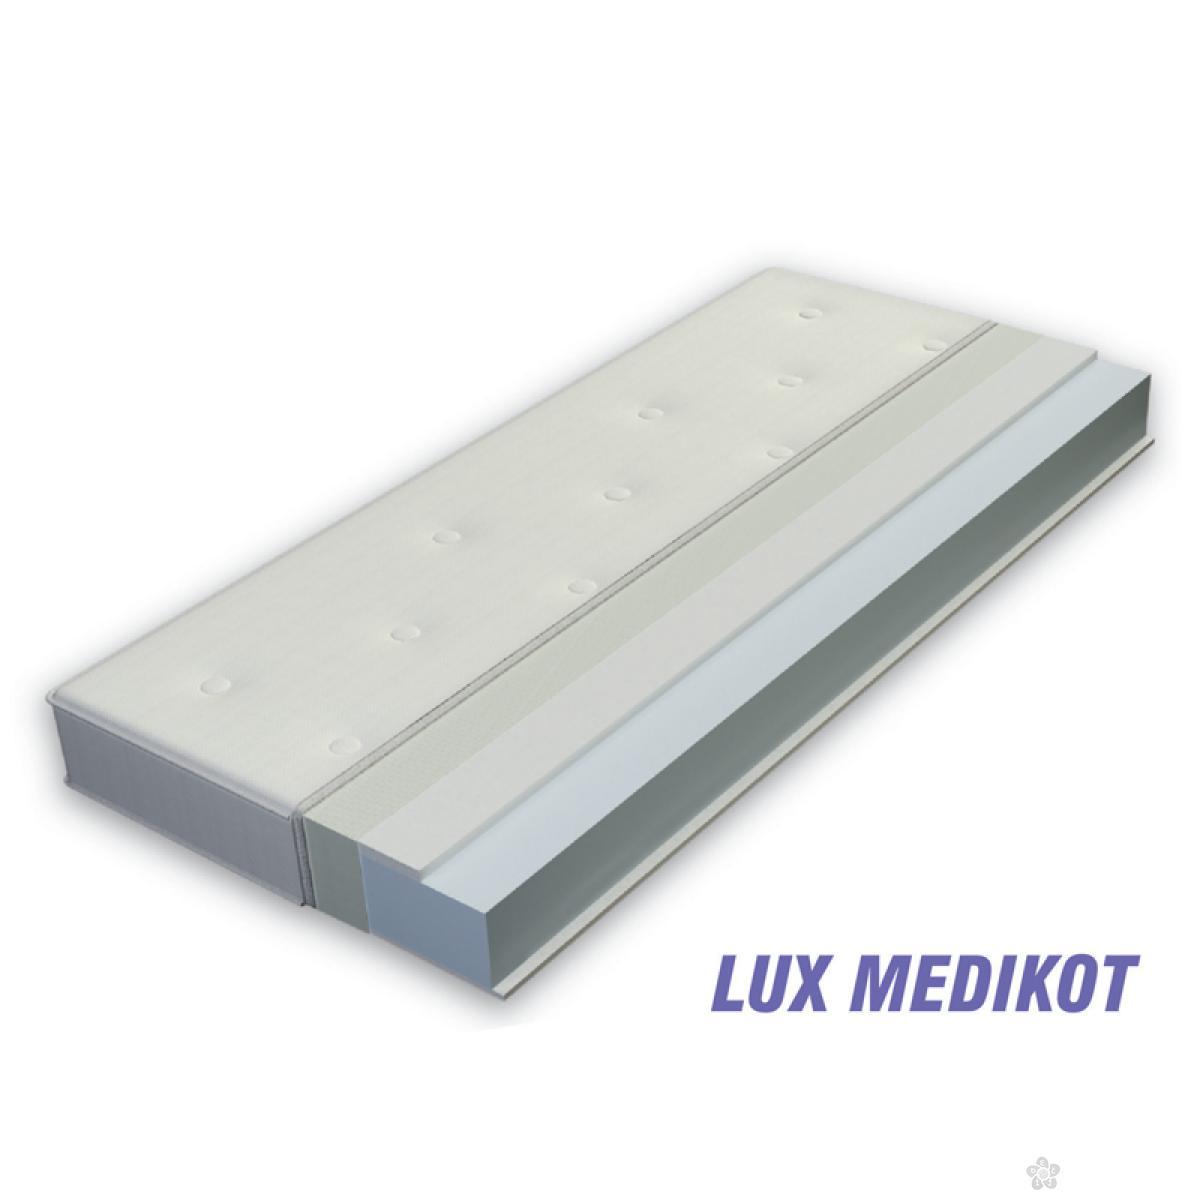 Luka dušek za krevetac - Lux 120x60